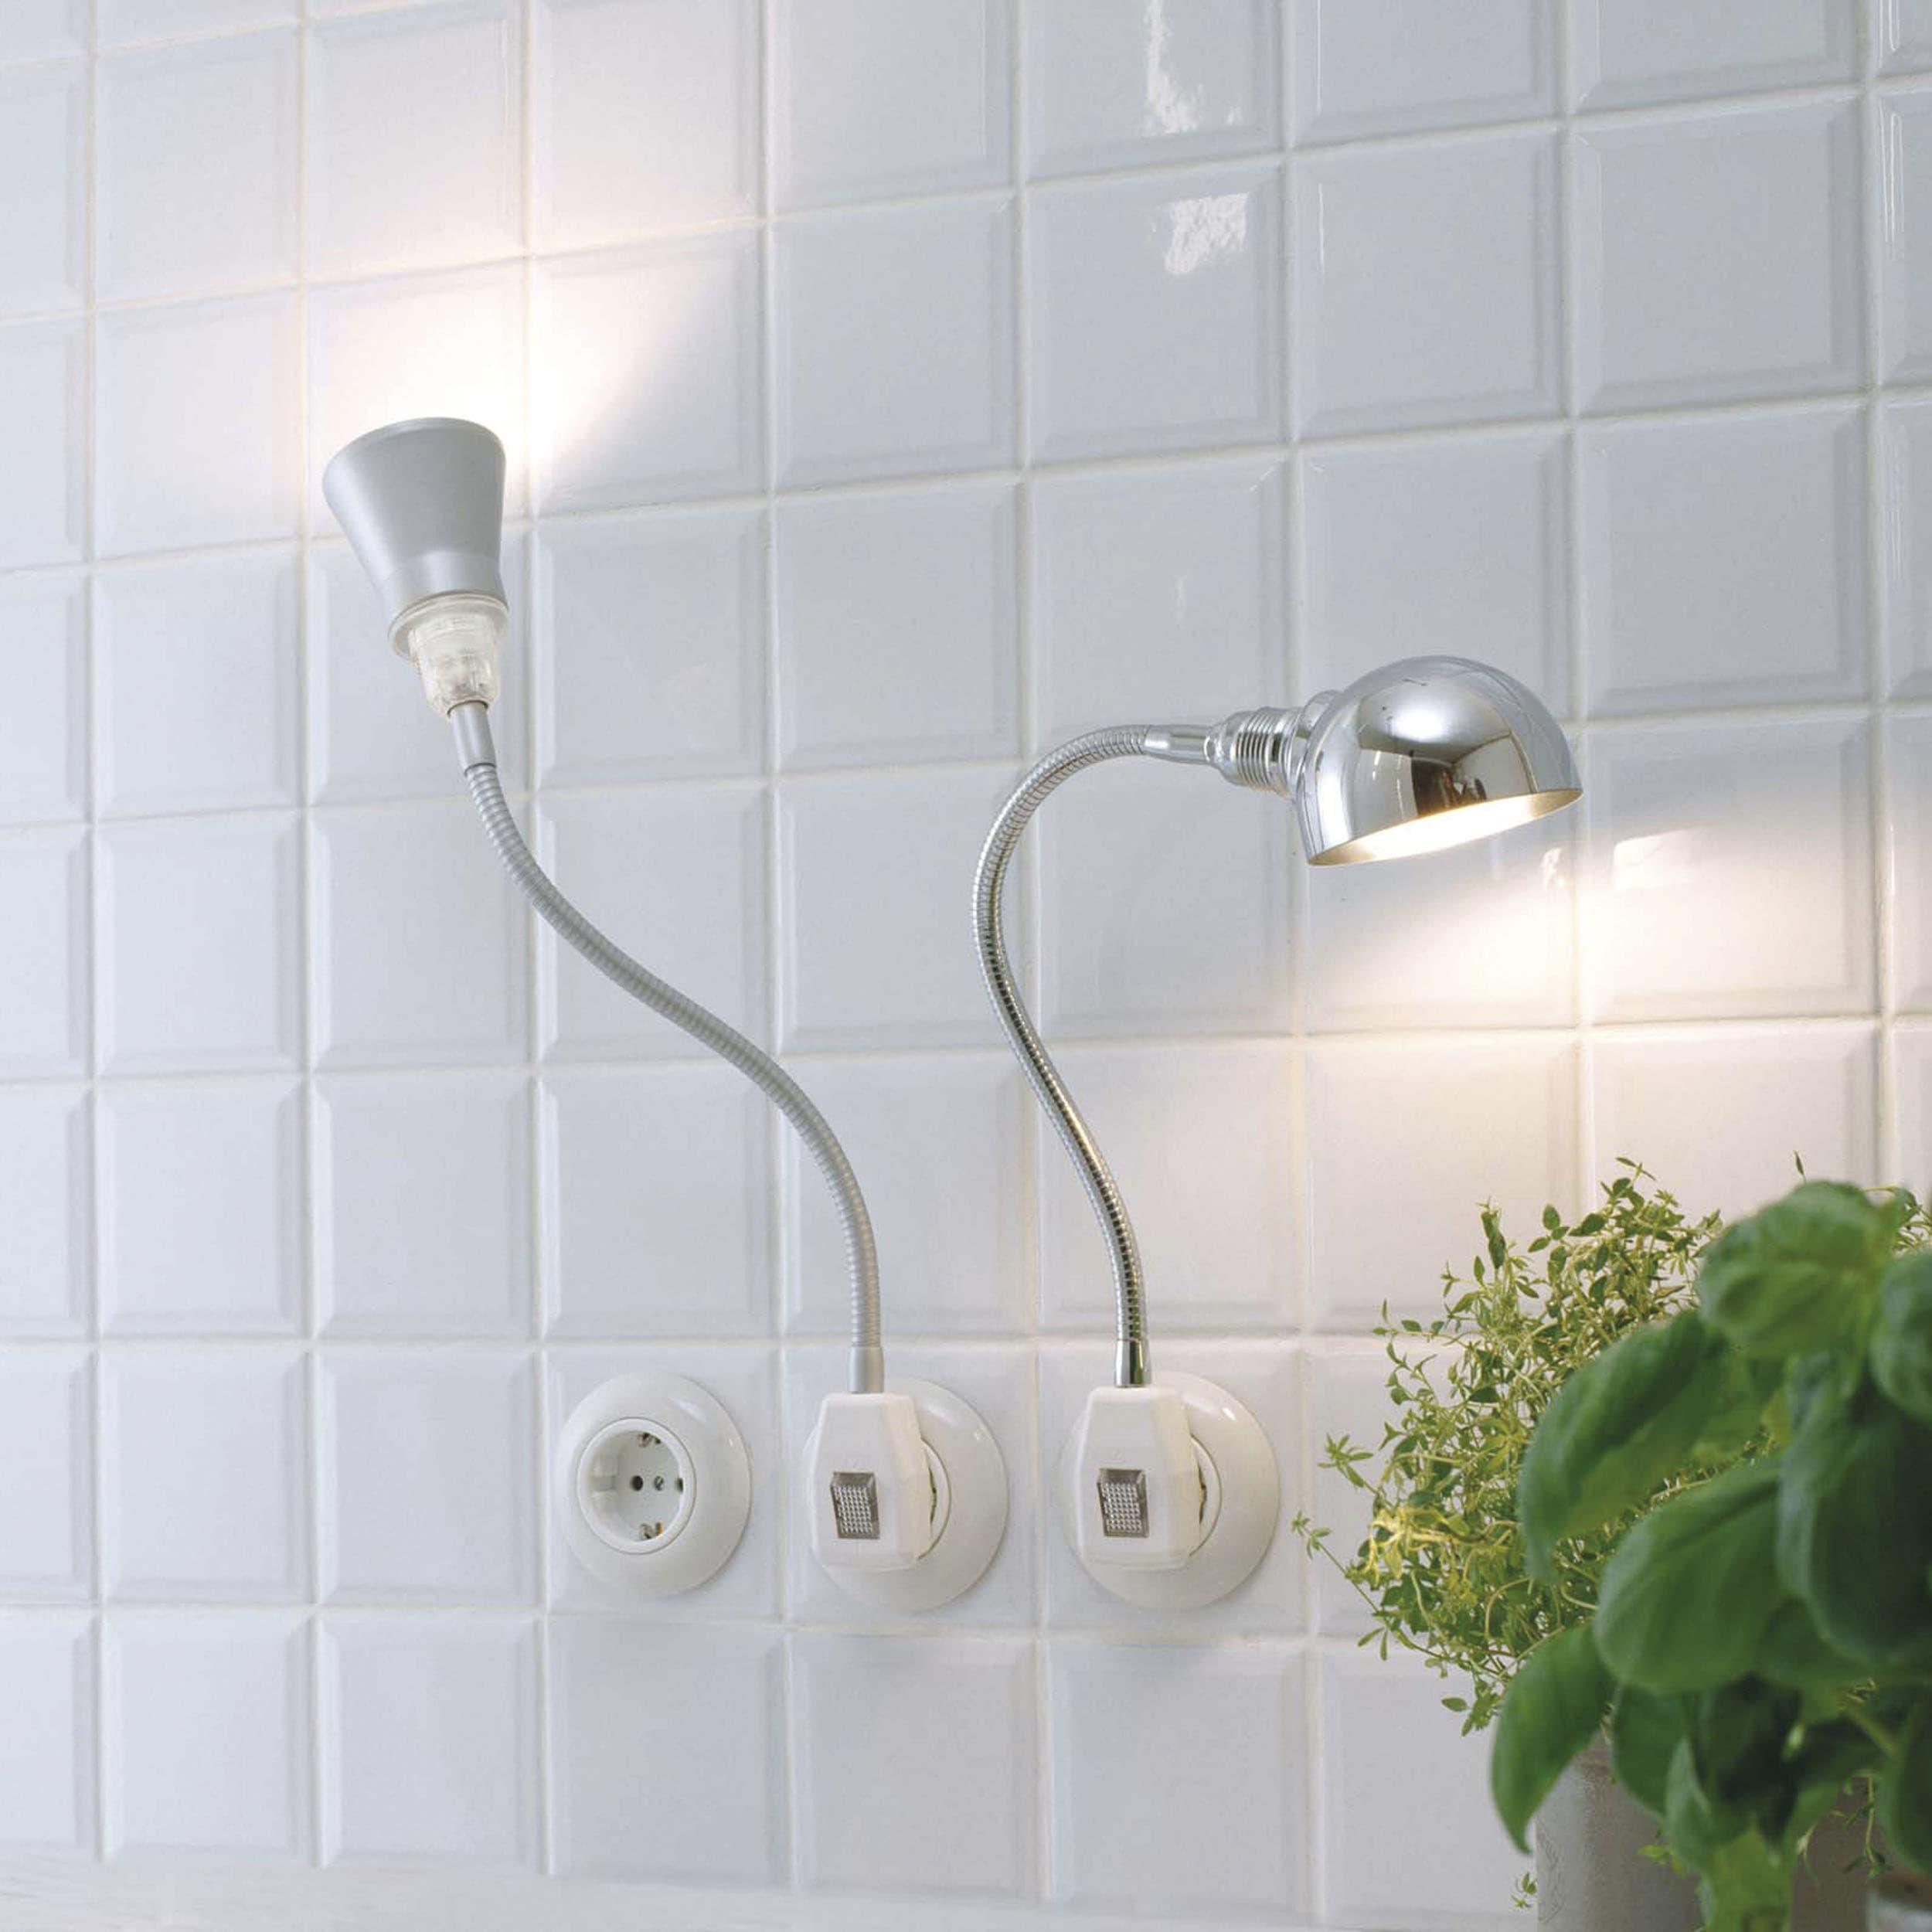 Glühwürmchen DeLight Alu-Kegelreflektor mit LED-Leuchtmittel